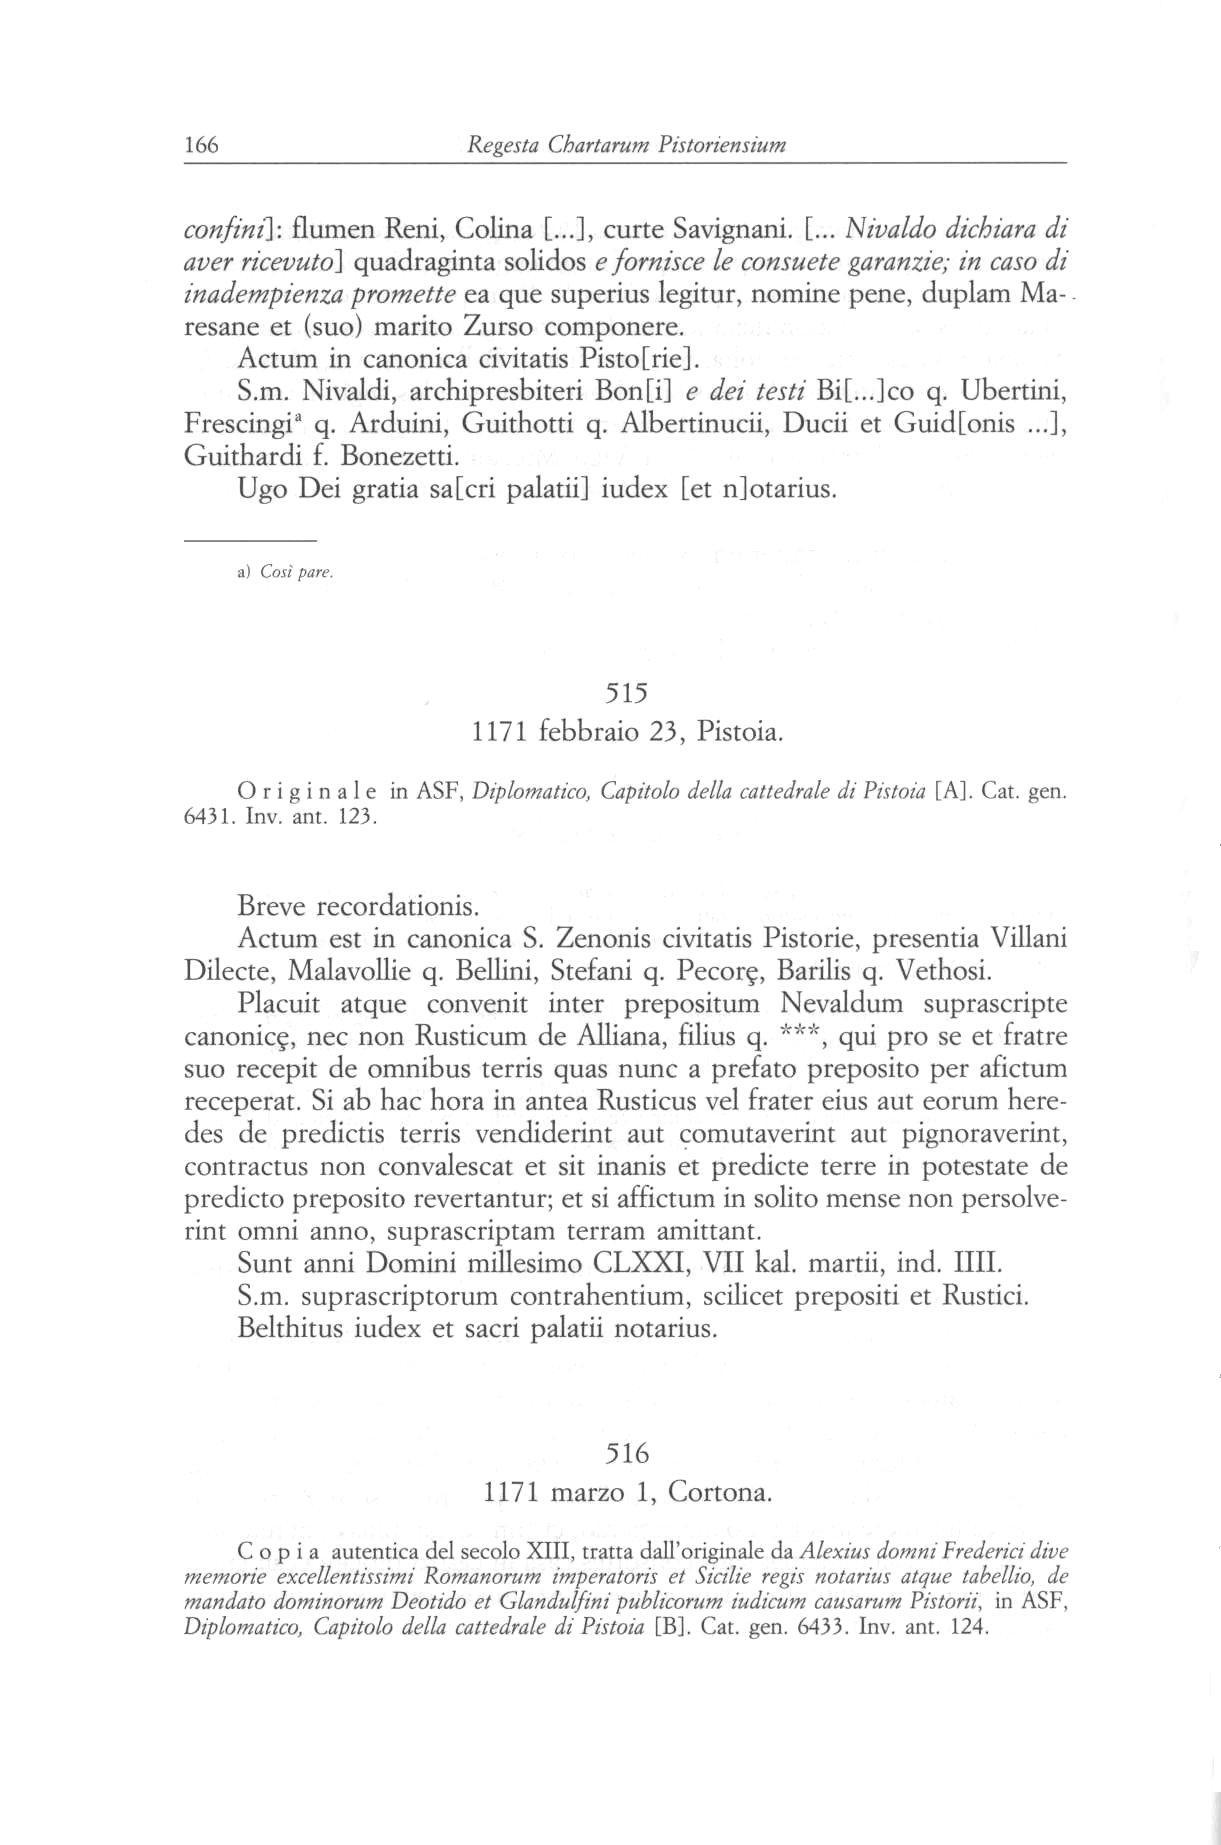 Canonica S. Zenone XII 0166.jpg